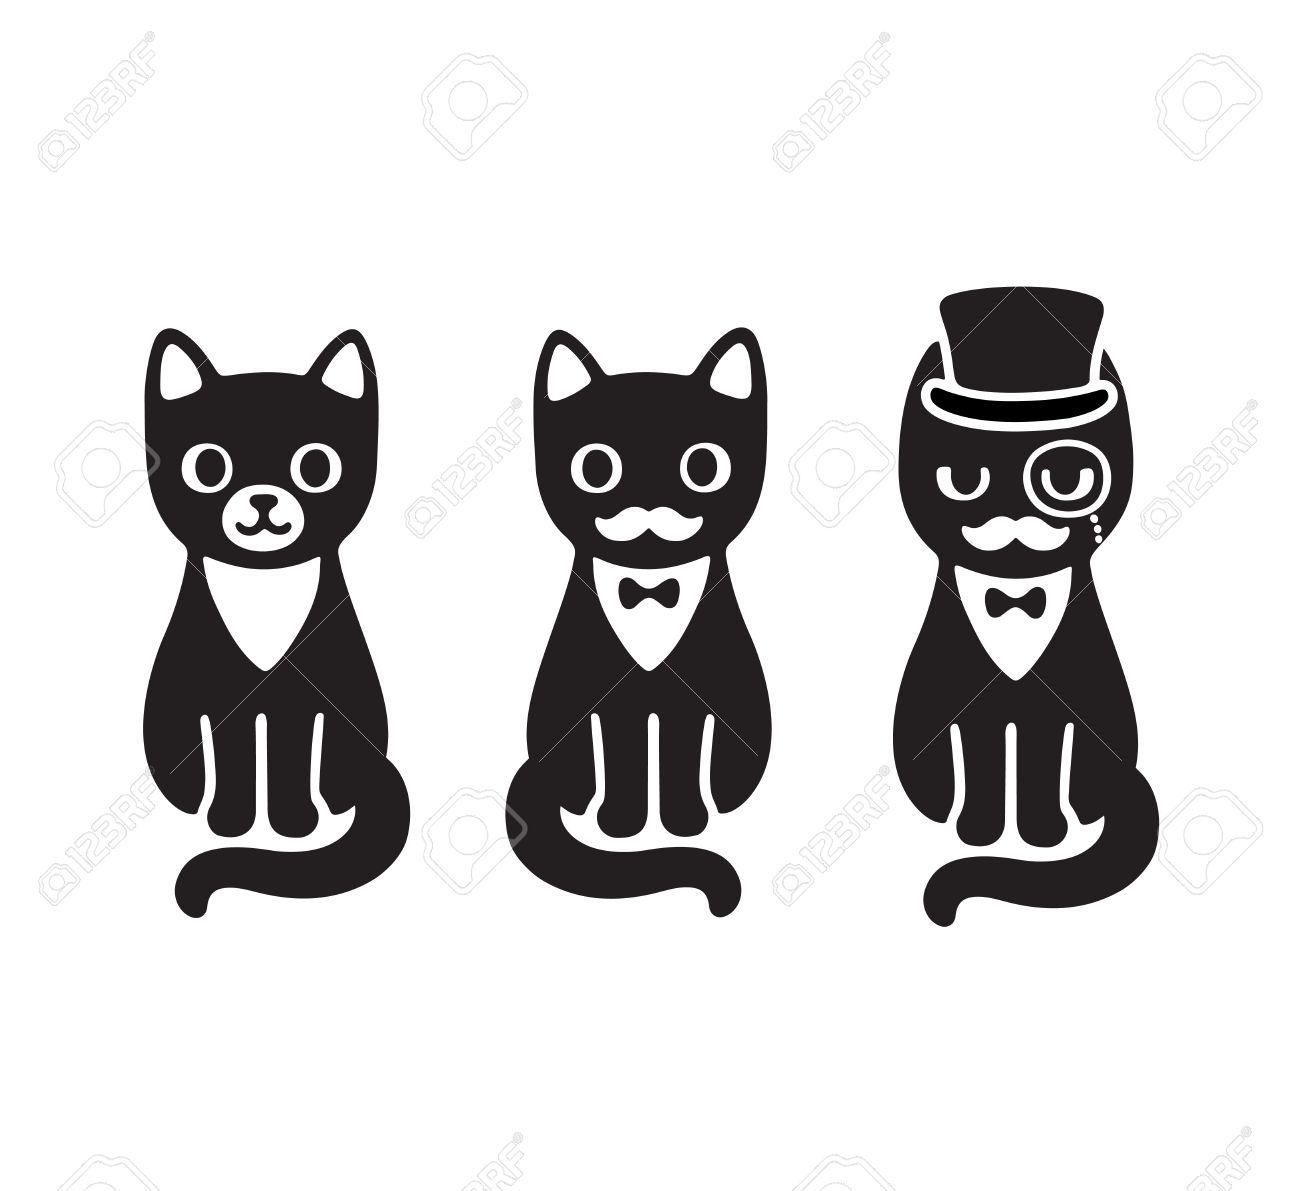 Cat Cute Cartoon Black And White